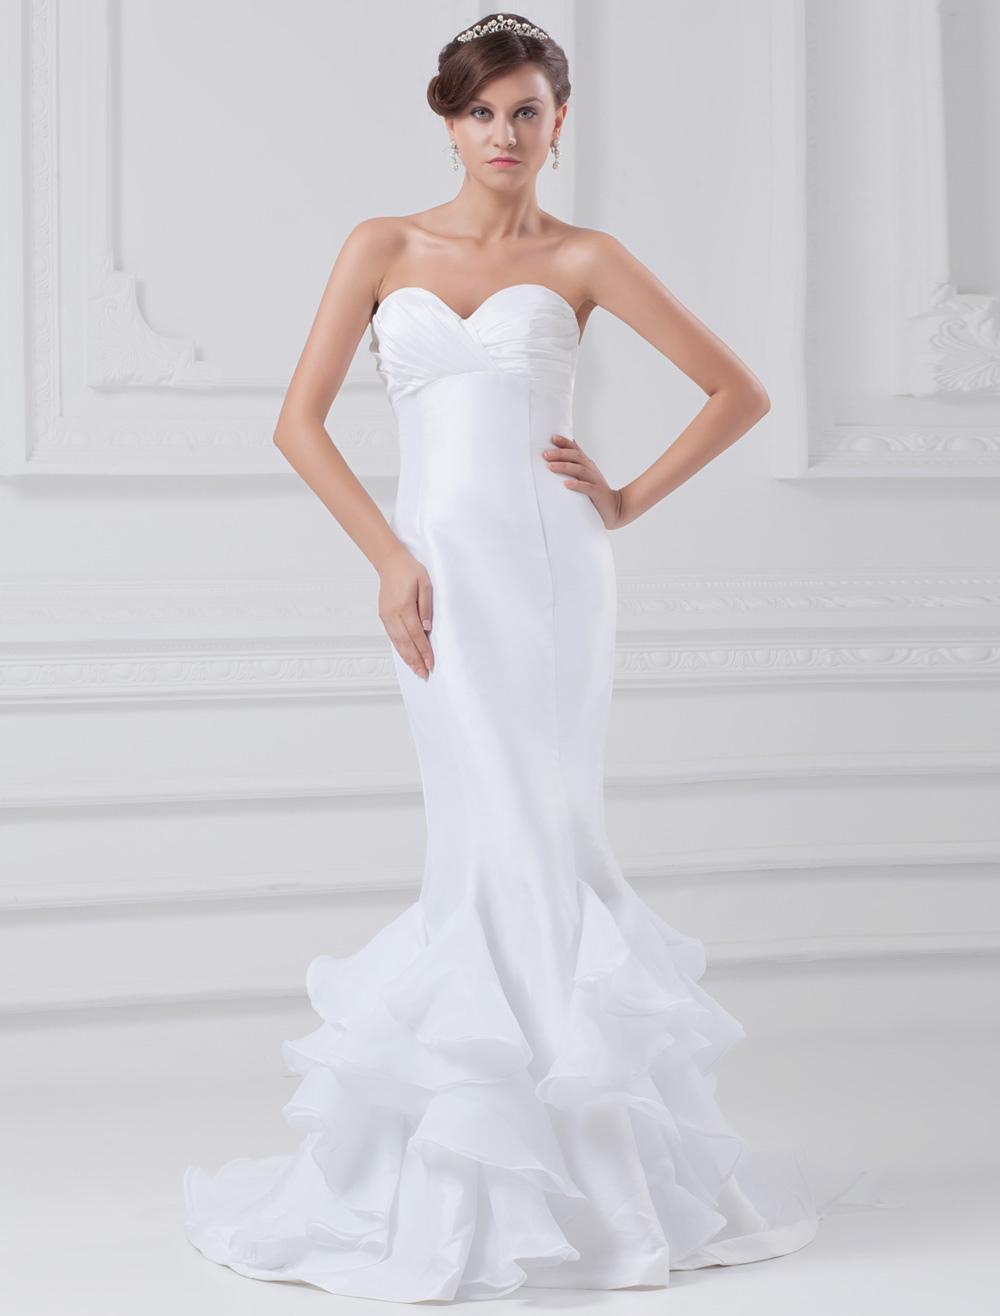 White Mermaid Sweetheart Neck Satin Bride's Wedding Dress photo